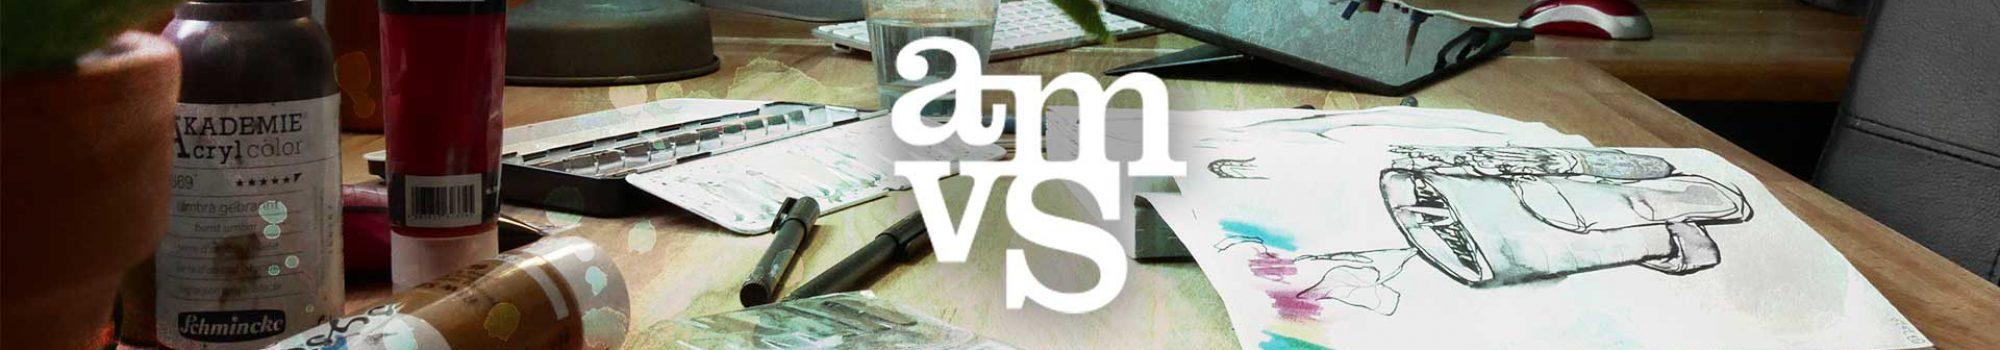 amvspreckelsen Illustration & Design Hamburg, Shopbanner